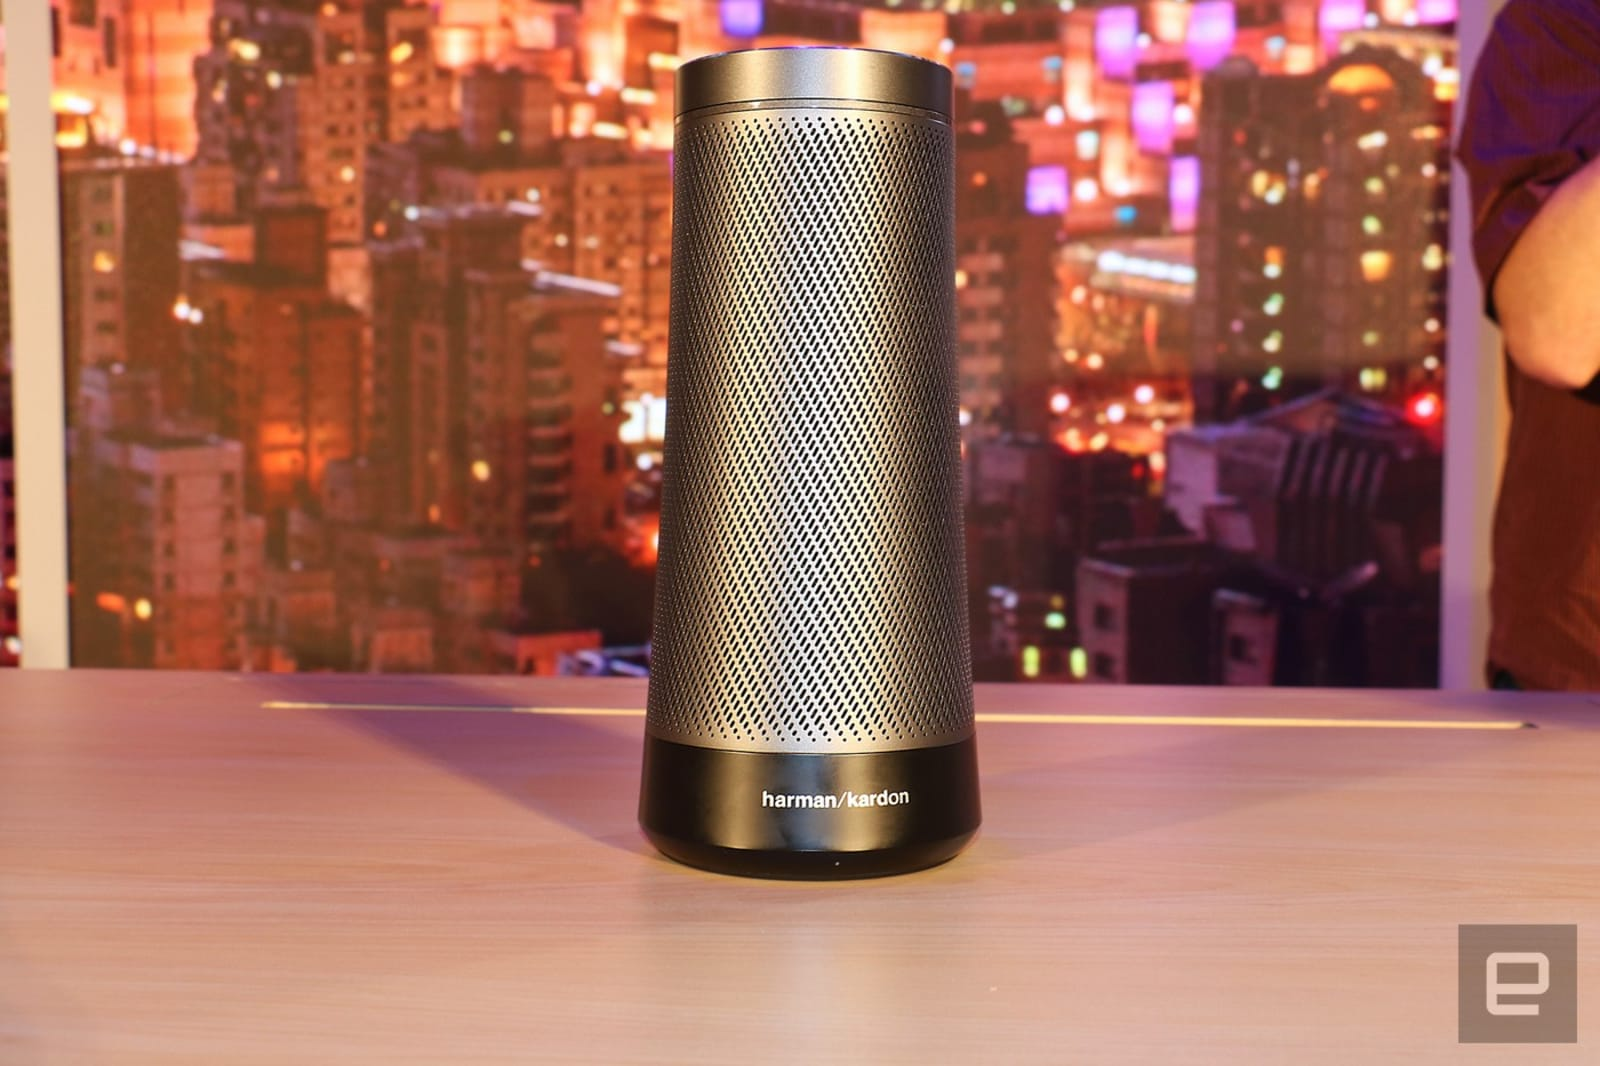 Harman Kardon Invoke review: The first Cortana speaker sounds amazing